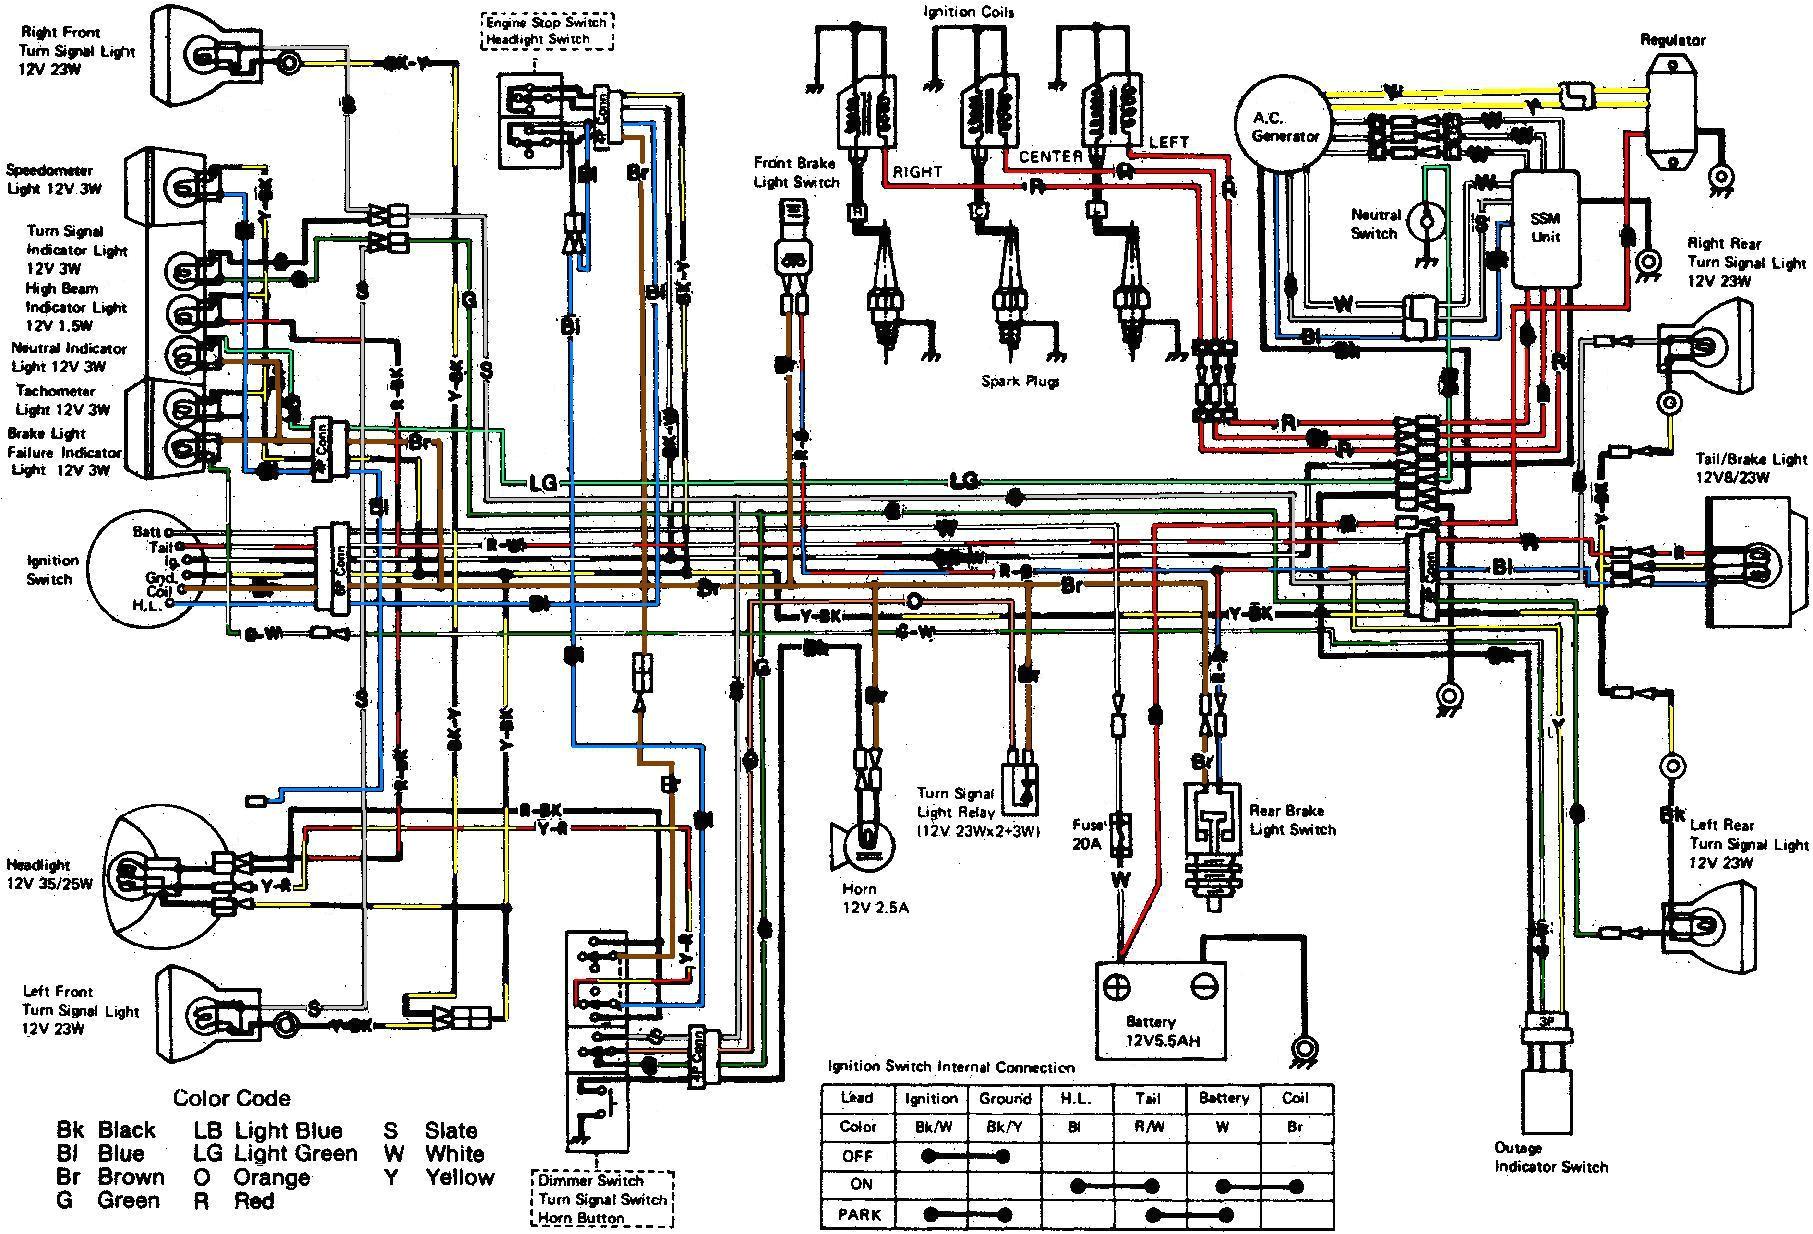 kawasaki bayou 220 wiring harness wiring diagram showkawasaki bayou 220 wiring diagram images wiring diagram list